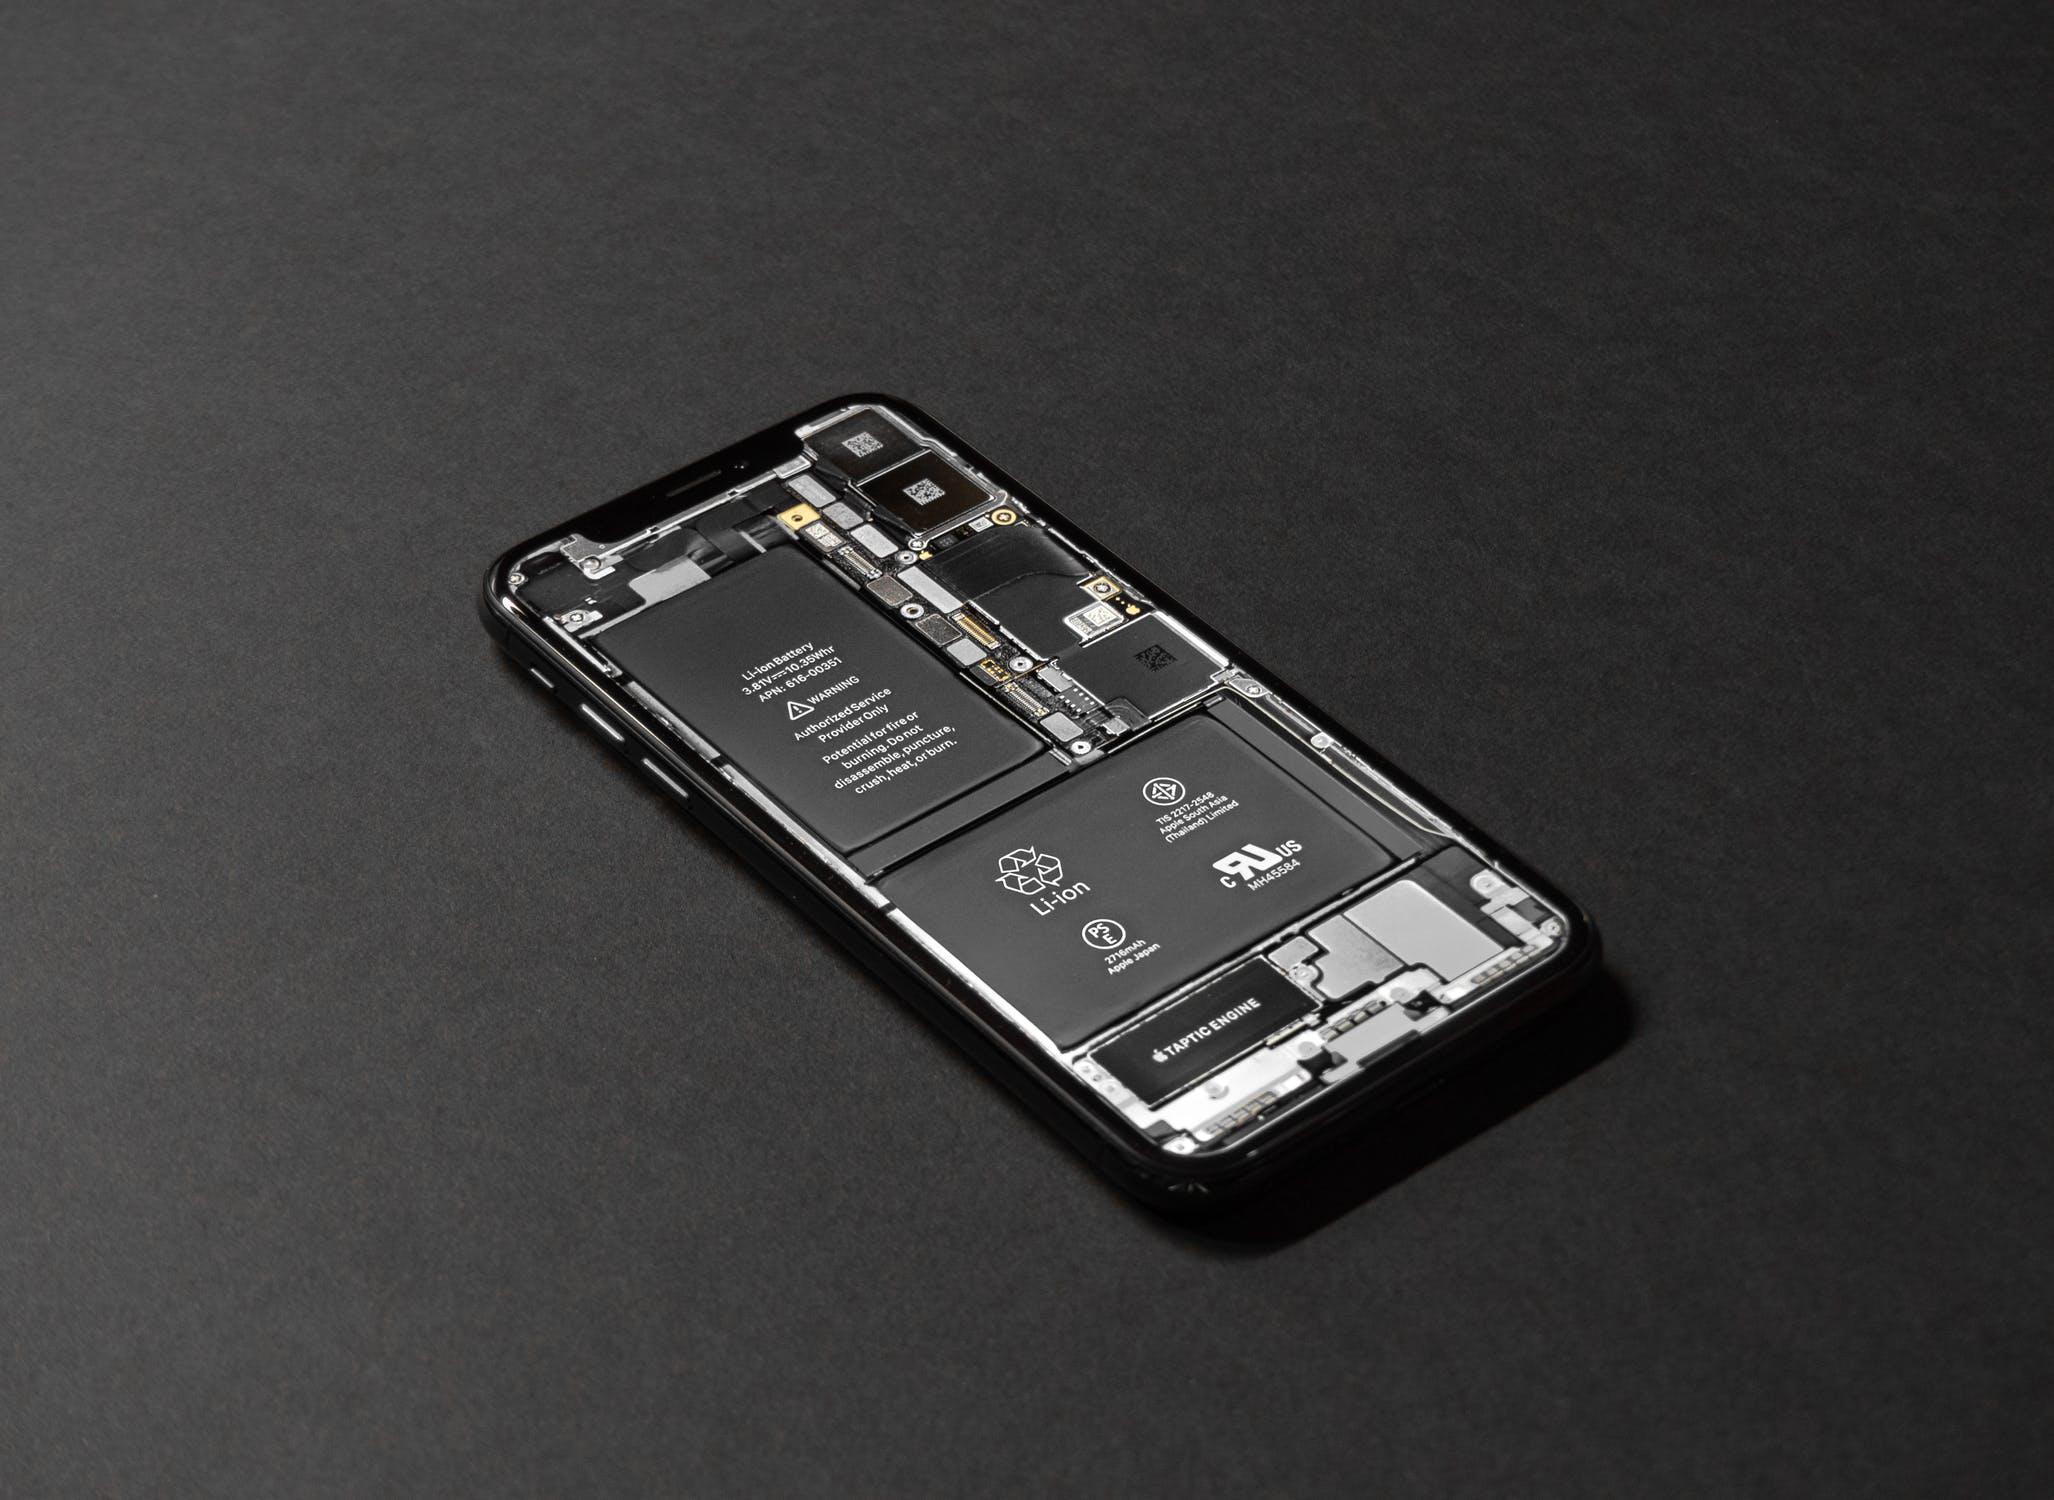 20 Tірѕ tо Sаvе Yоur mobile phone battery life